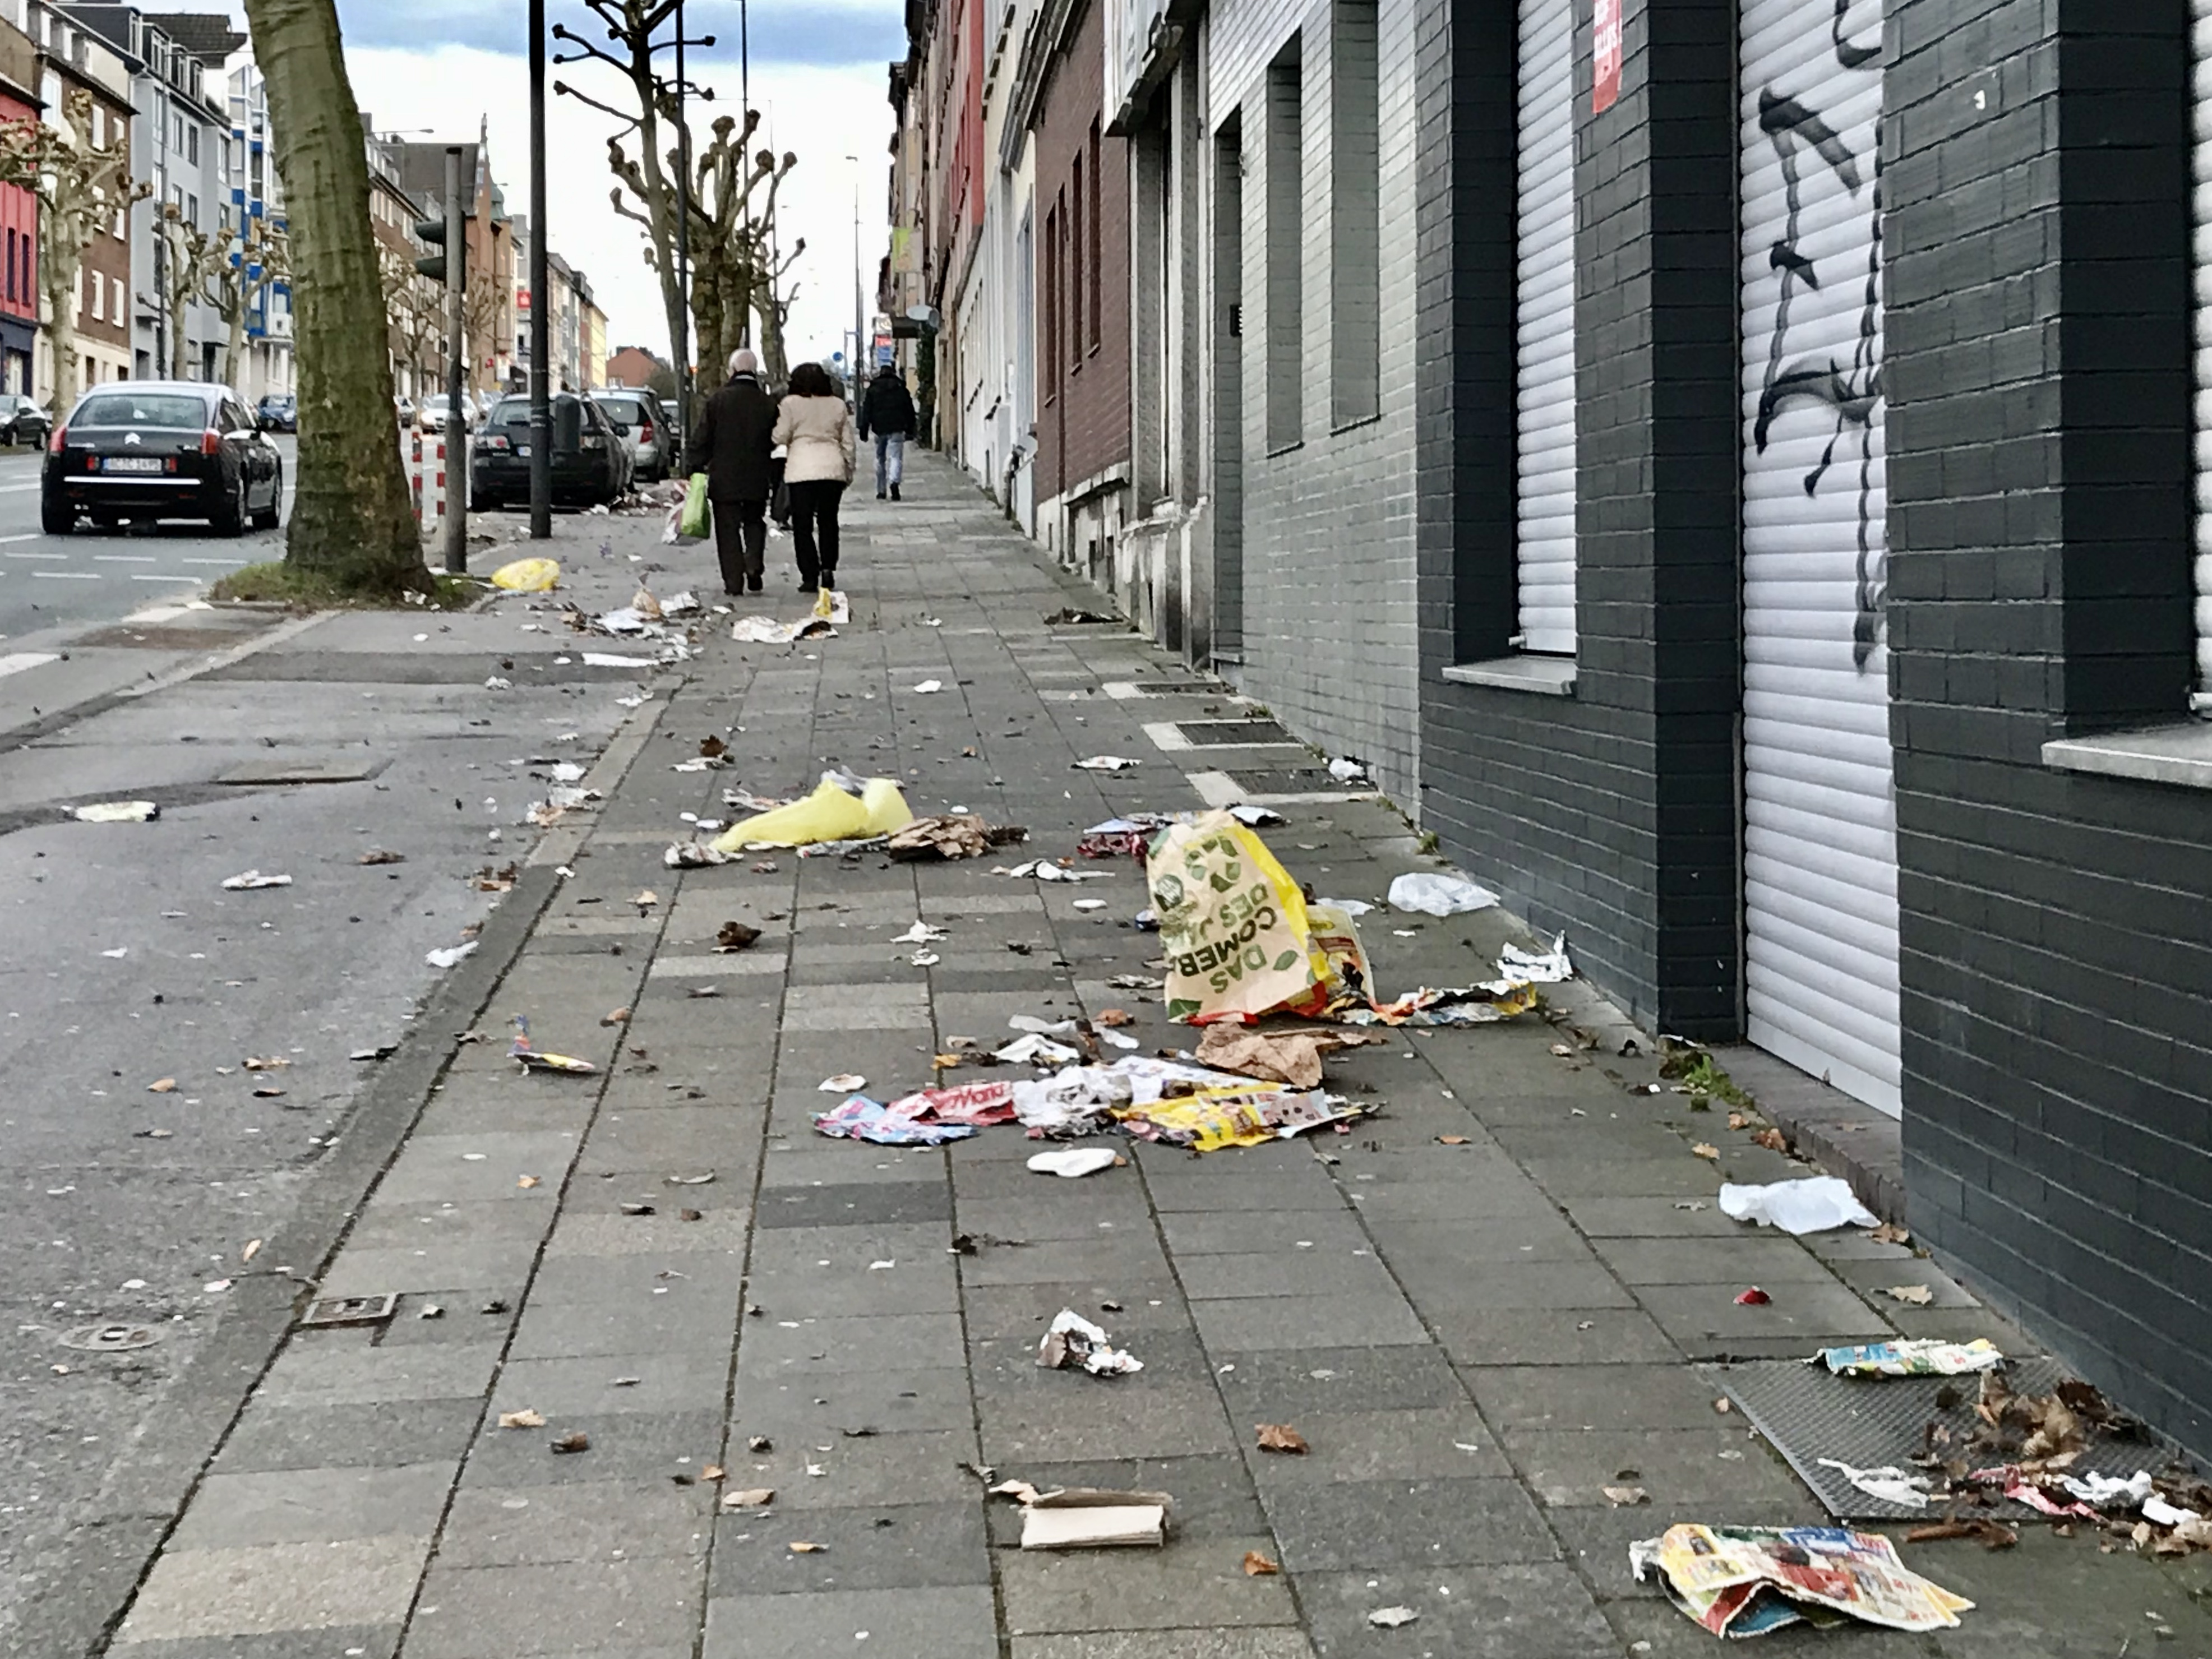 Krass: Sturm hinterlässt Spuren in Aachen – Neue Brücke endlich fertig